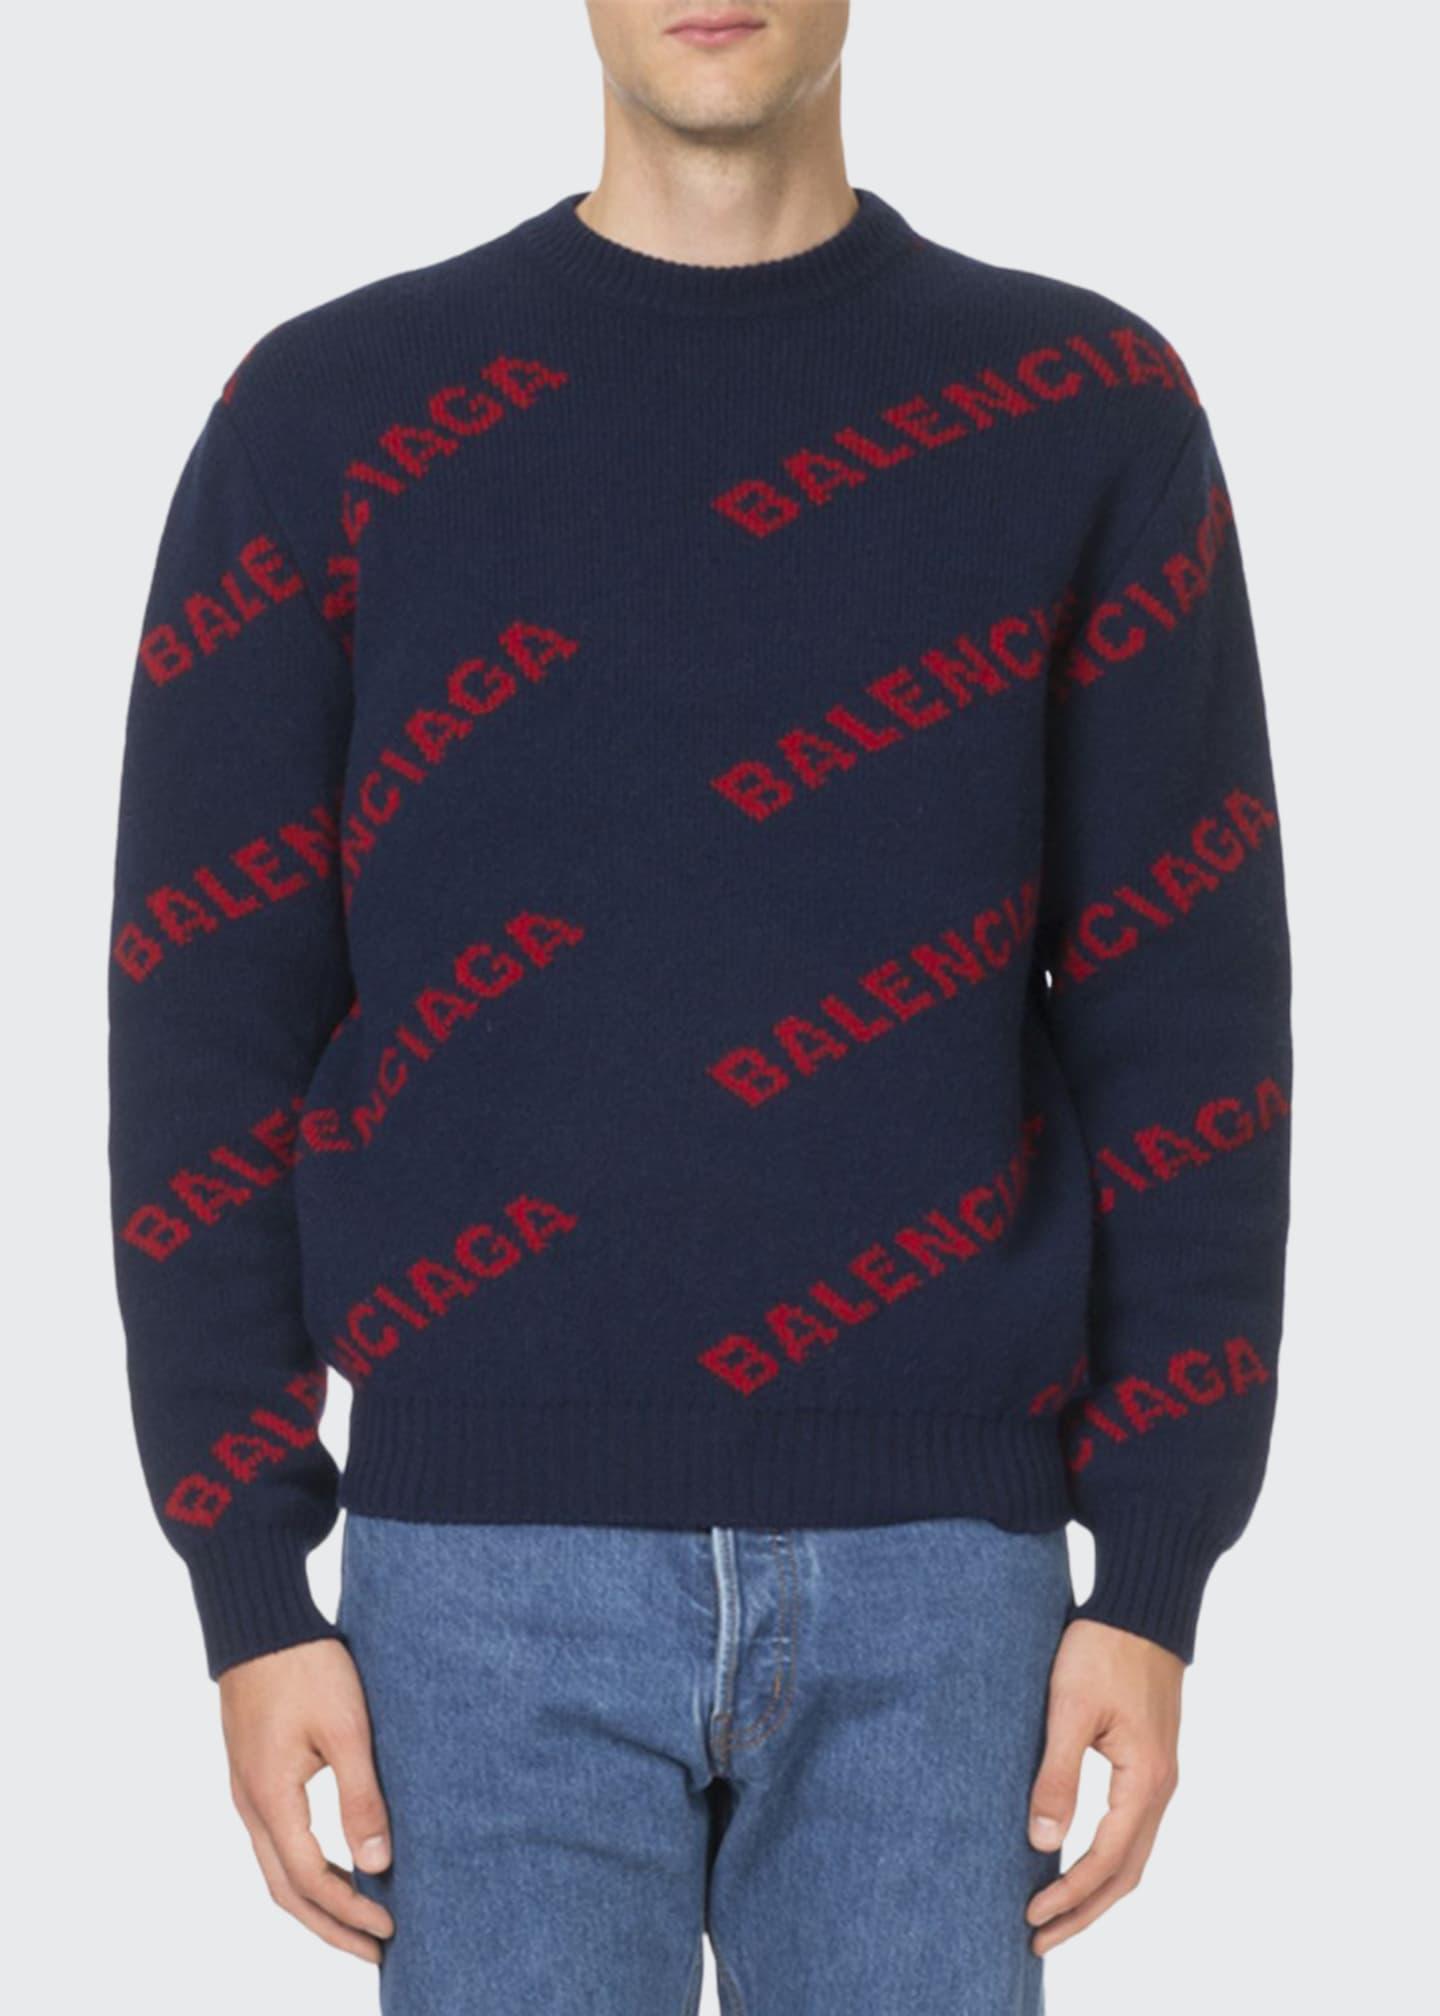 Balenciaga Men's Wool-Blend Logo Intarsia Sweater